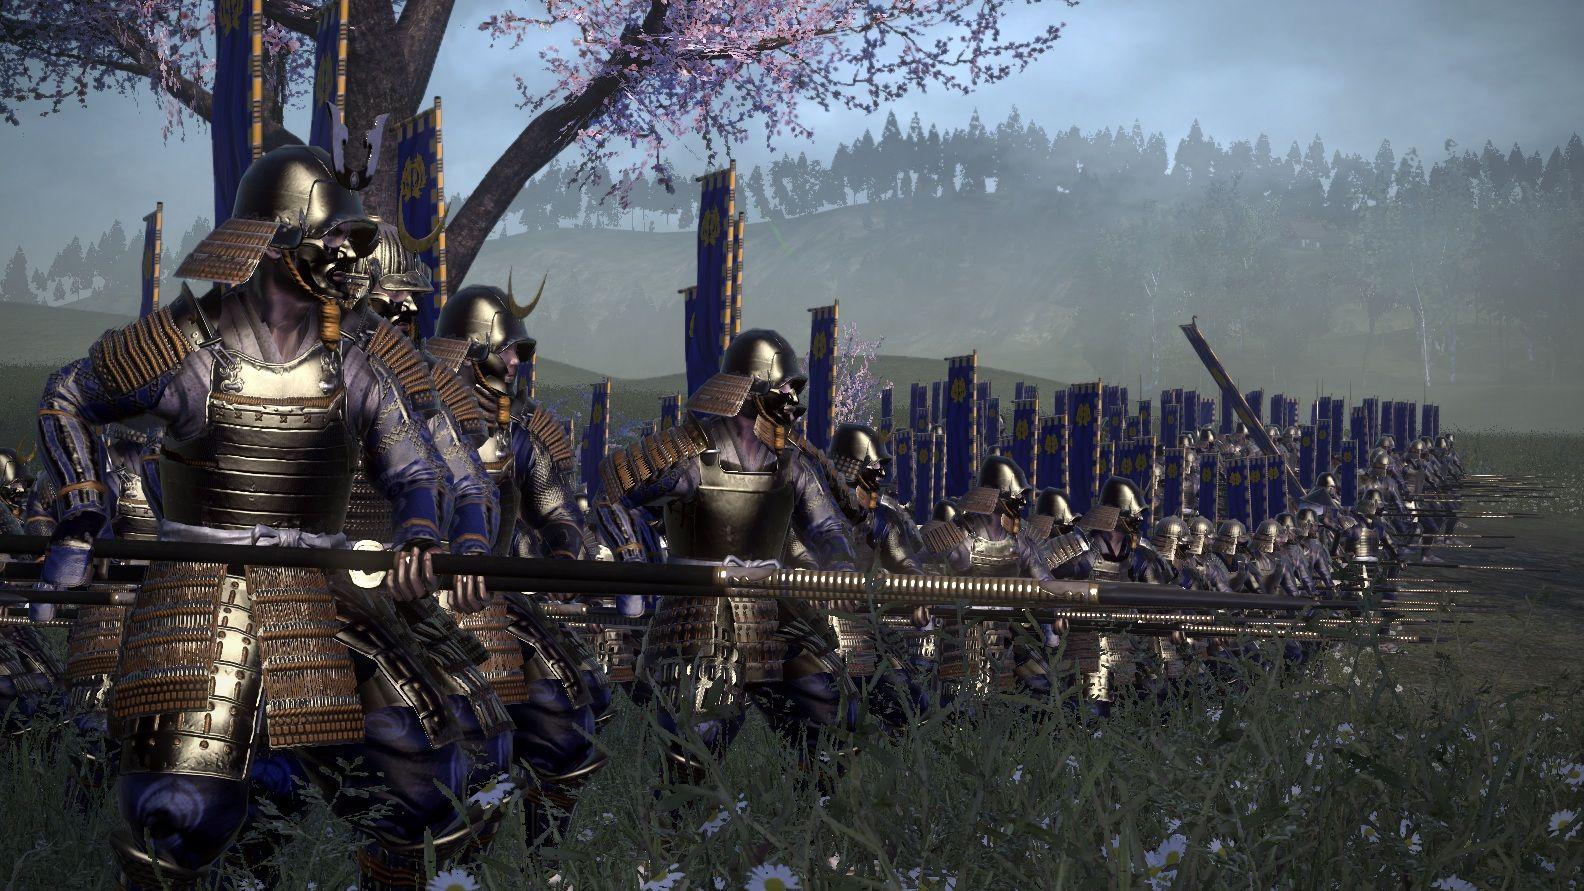 Total War: SHOGUN 2 - Sengoku Jidai Unit Pack on Steam